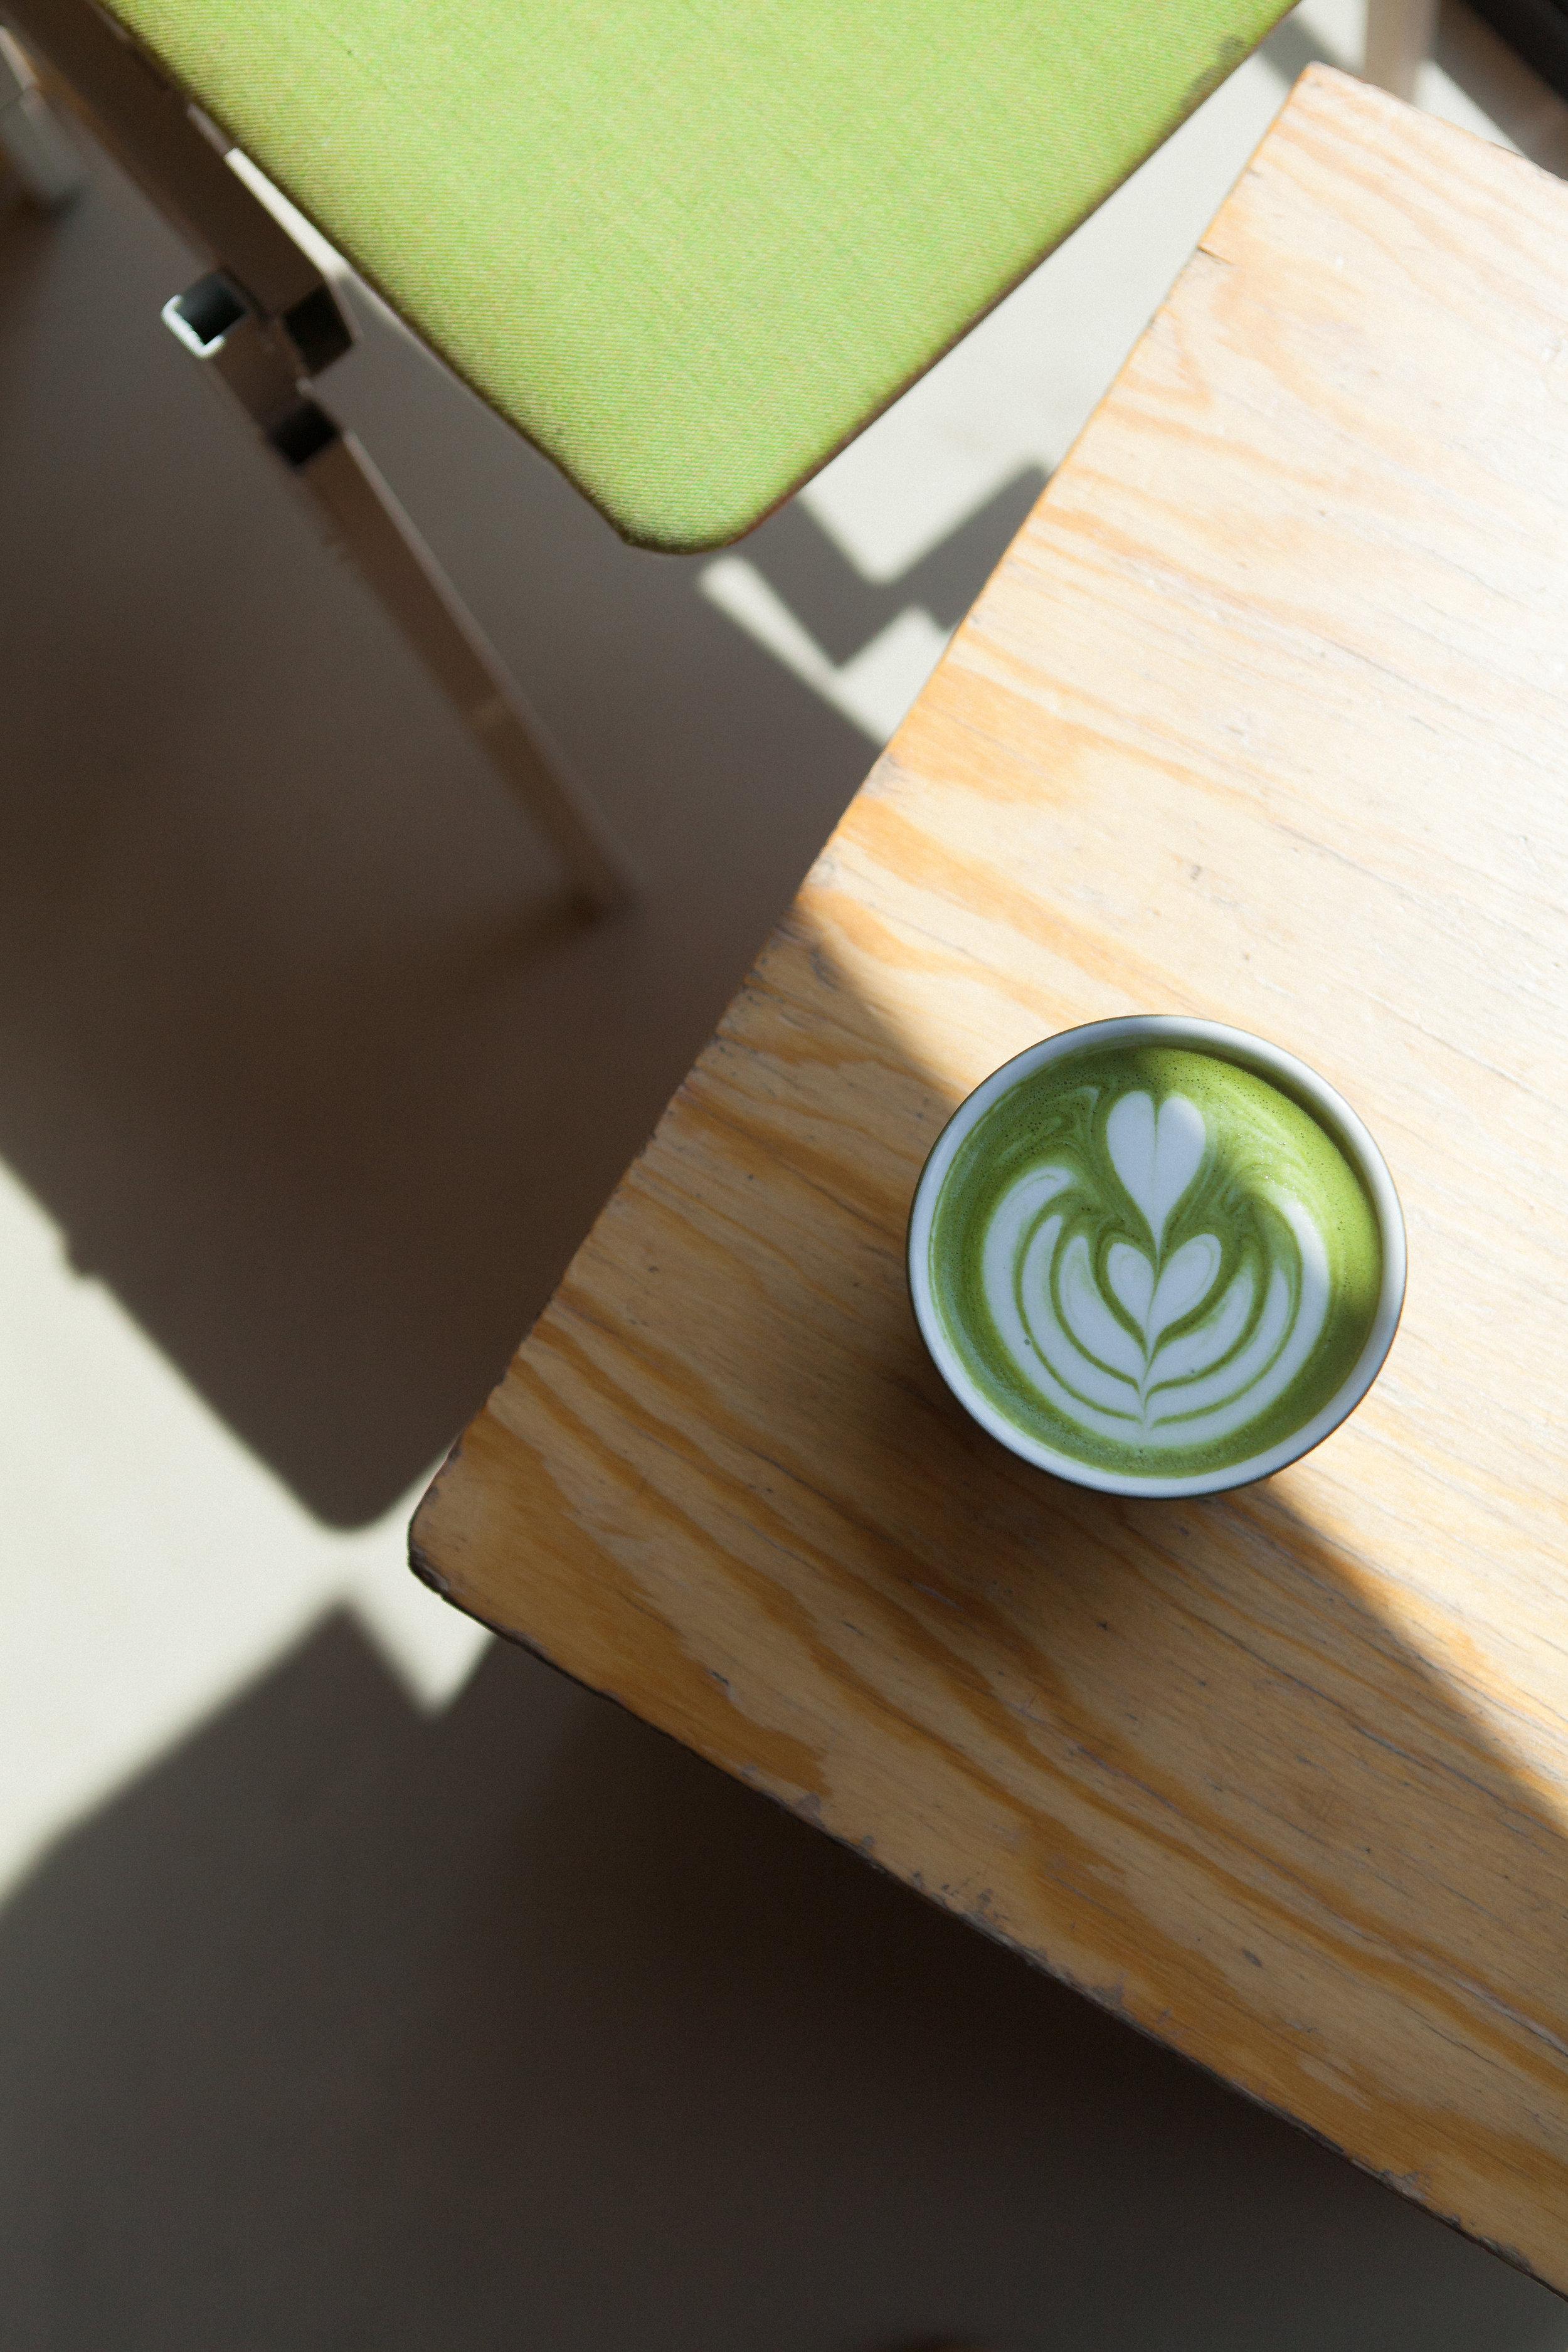 cc summerdrinks matcha latte-59.jpg